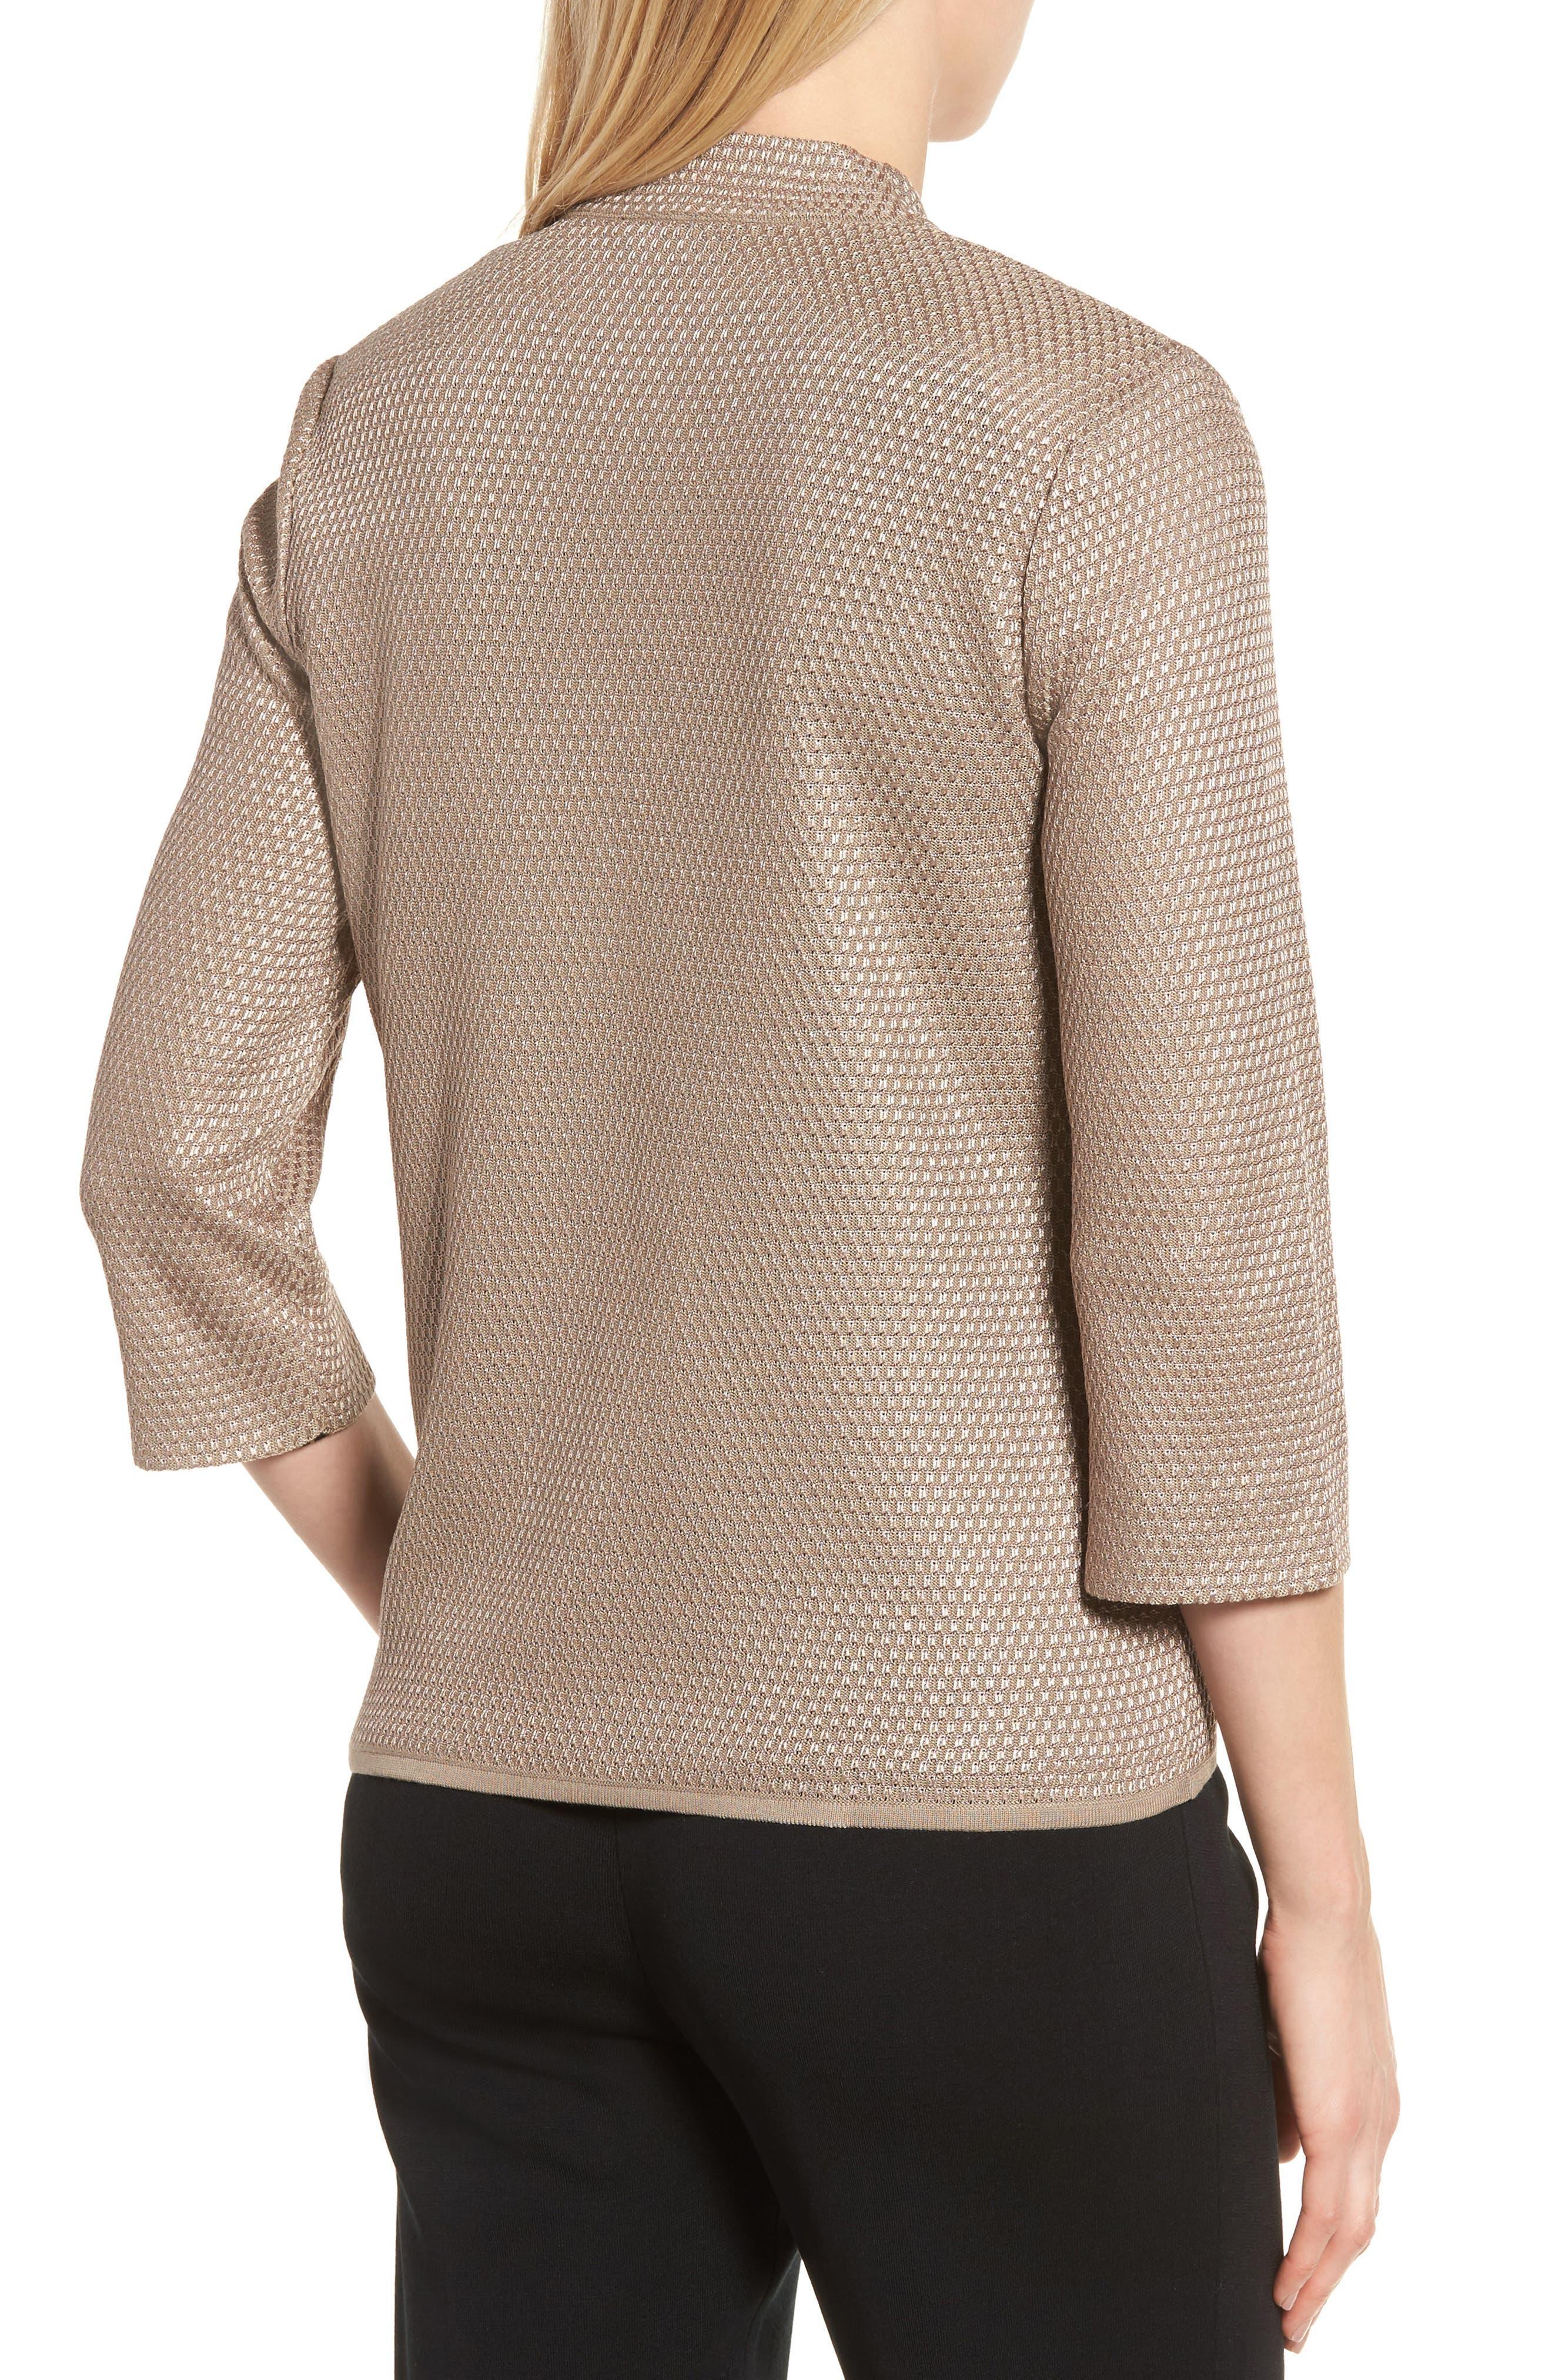 Textured Knit Jacket,                             Alternate thumbnail 2, color,                             250